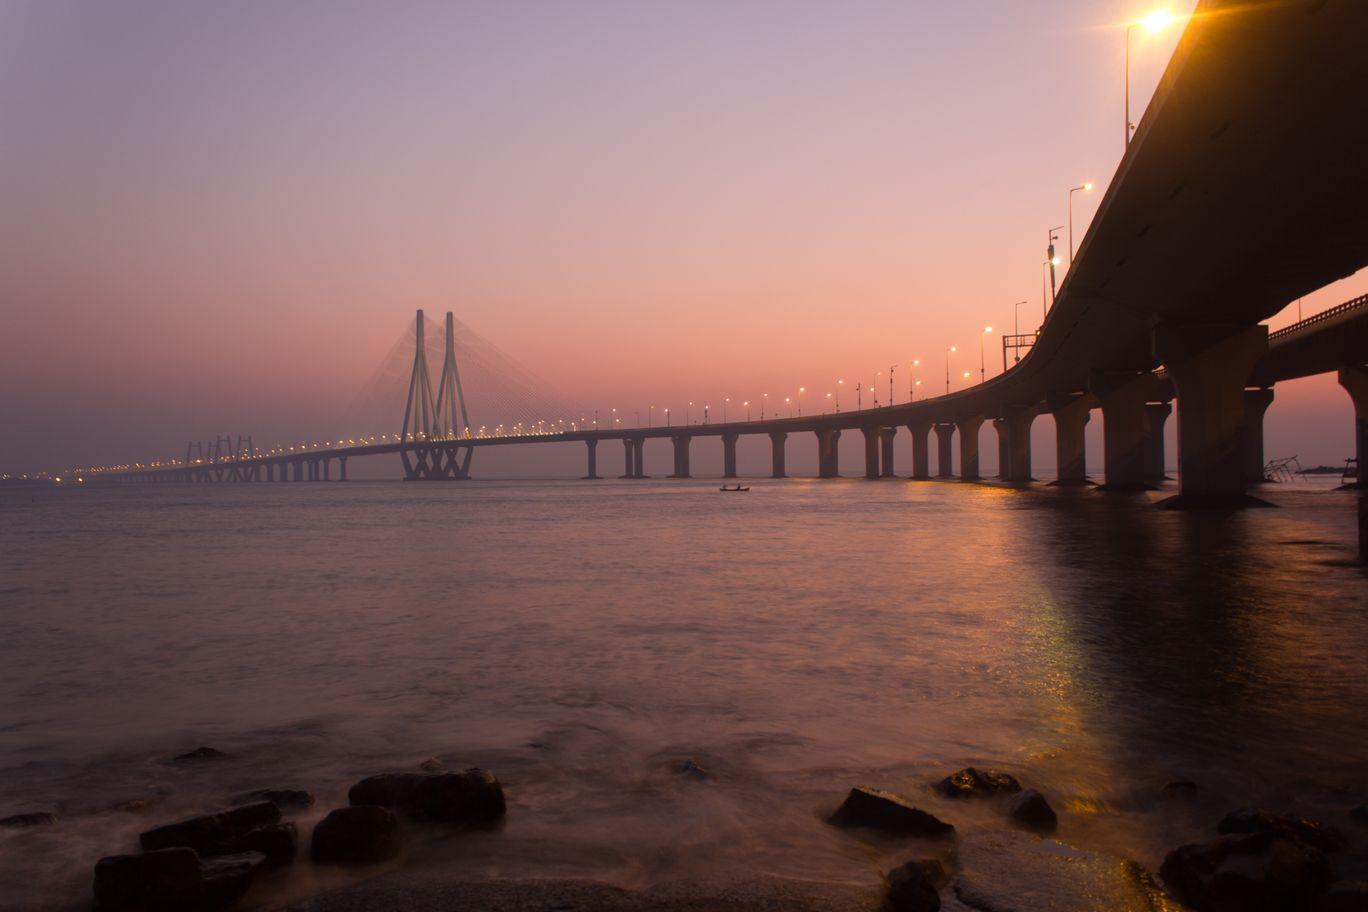 Photo of Bandra Worli Sea Link By Manish Dandekar